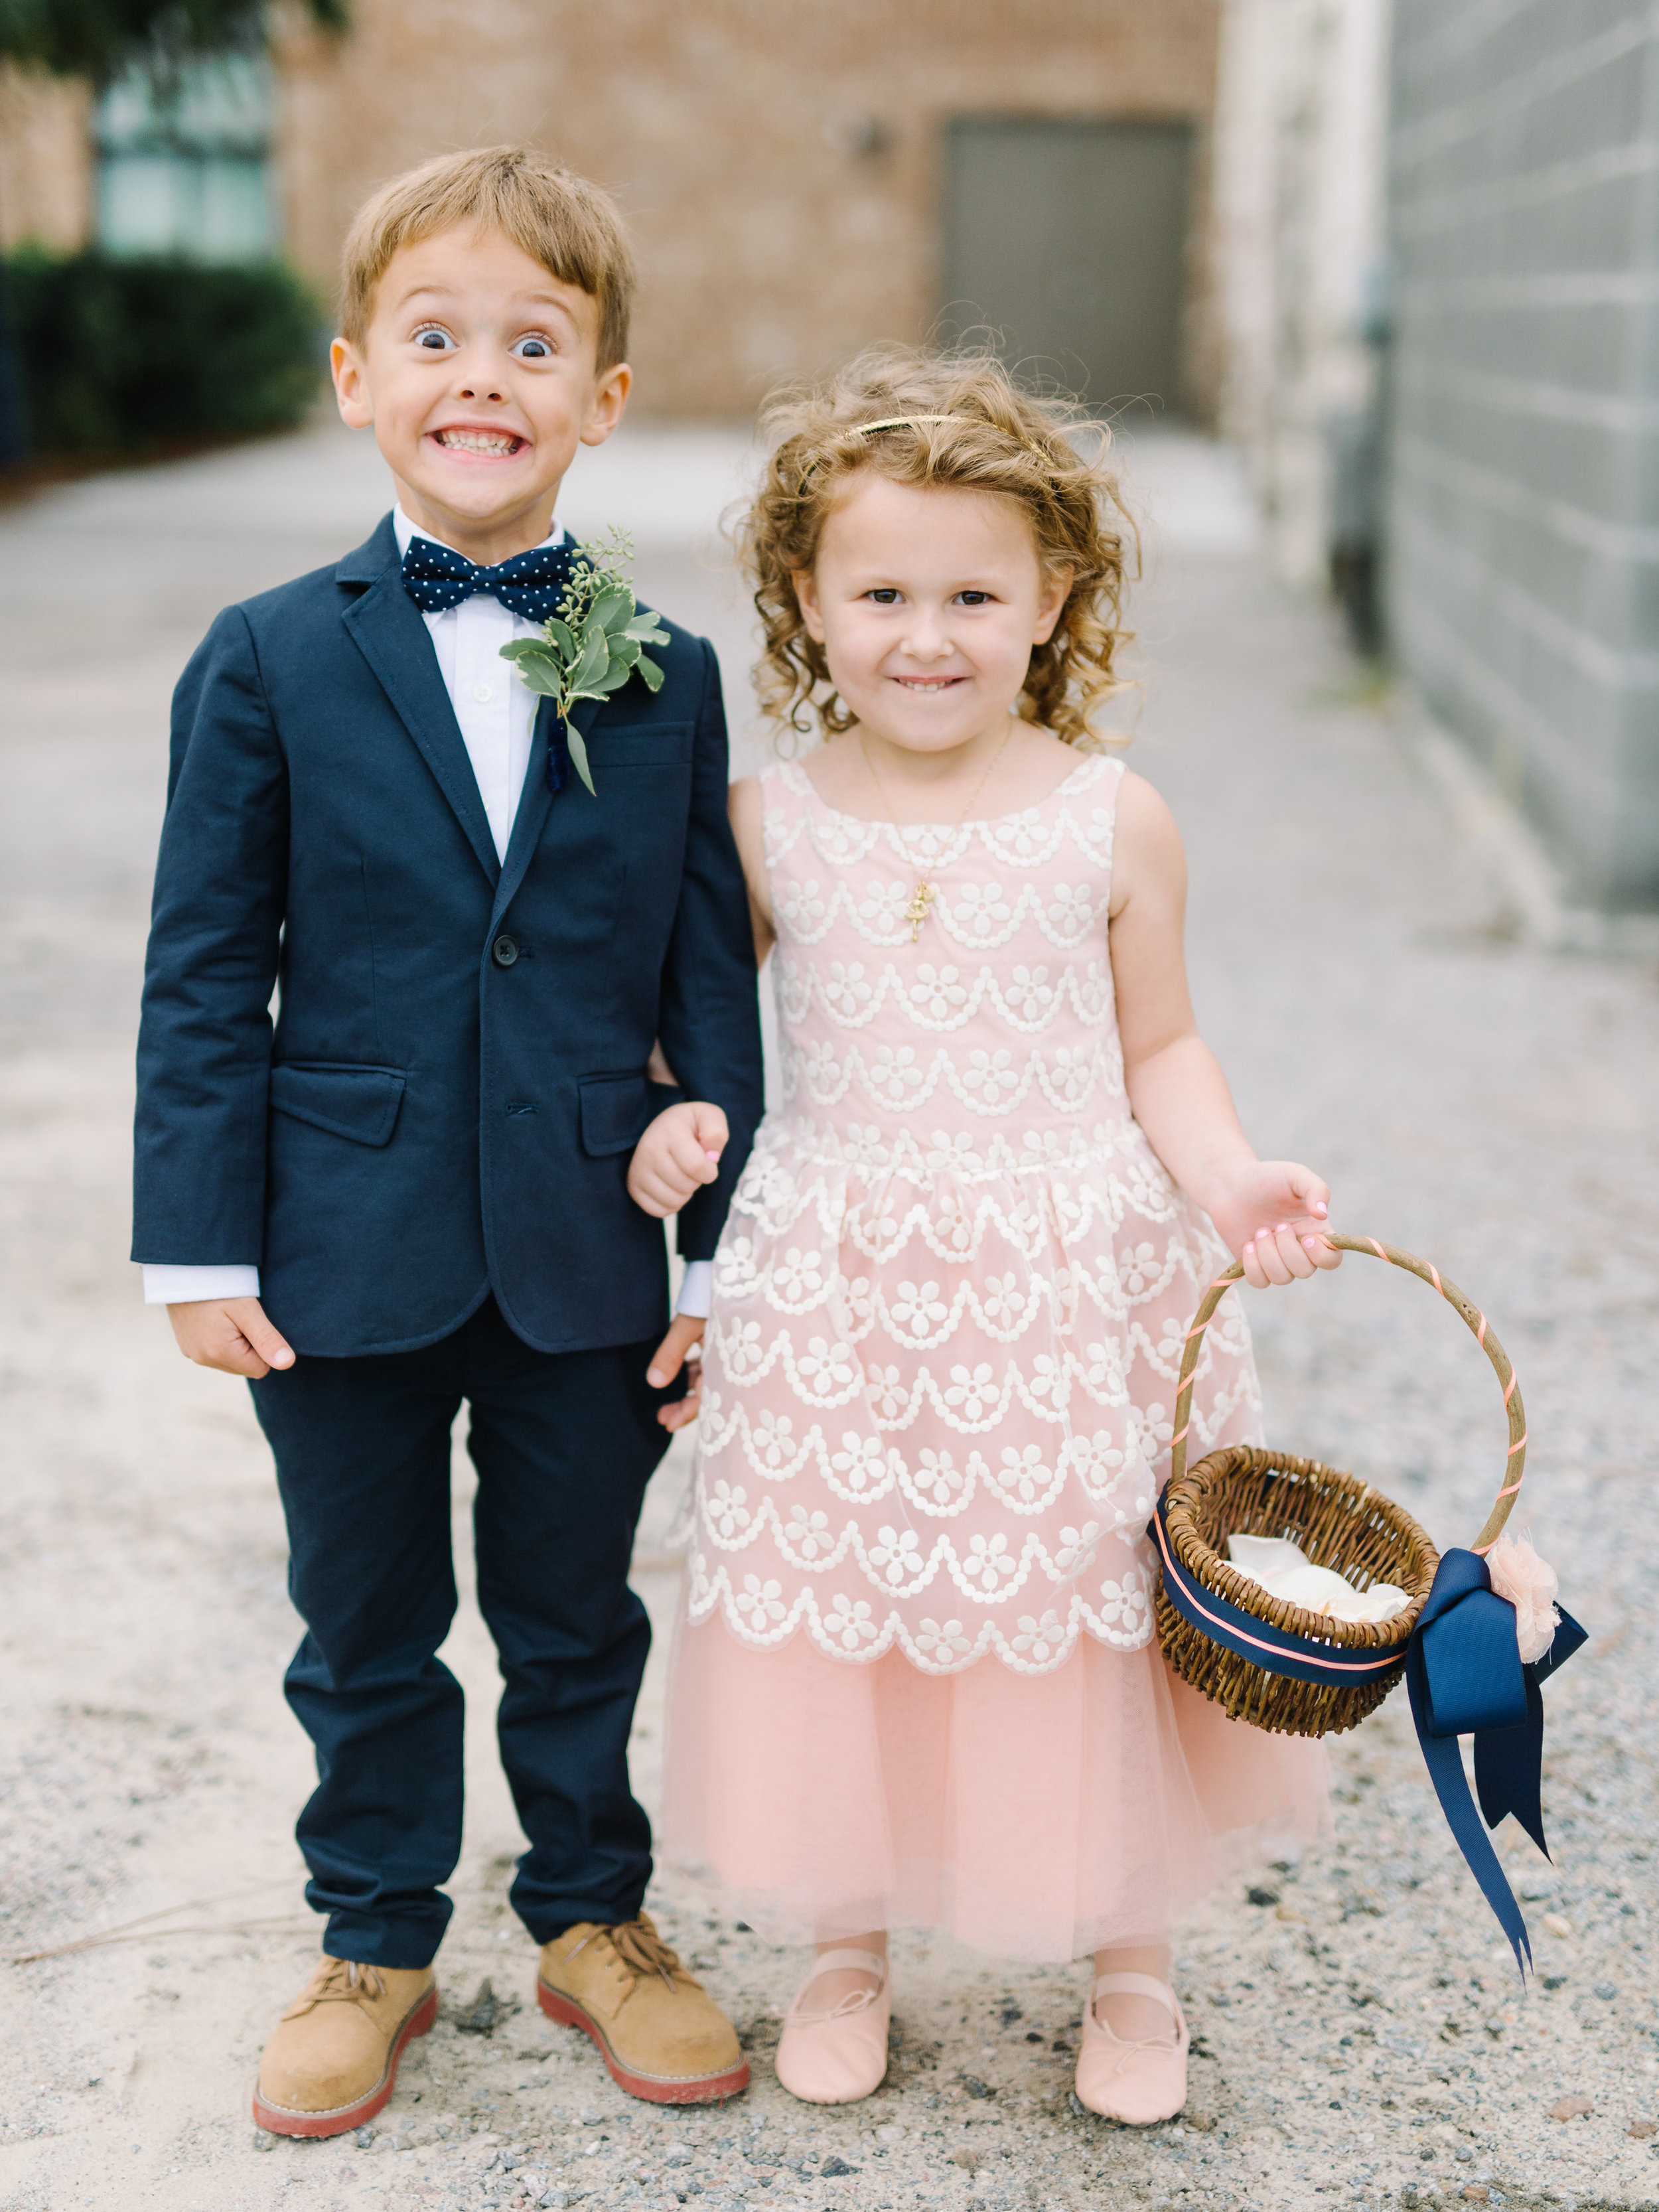 amber-and-paul-rach-loves-troy-charles-h-morris-center-wedding-sarah-seven-helene-lace-wedding-dress-ivory-and-beau-bridal-boutique-savannah-wedding-planner-savannah-event-designer-savannah-florist-savannah-weddings-savannah-bridal-boutique-31.jpg